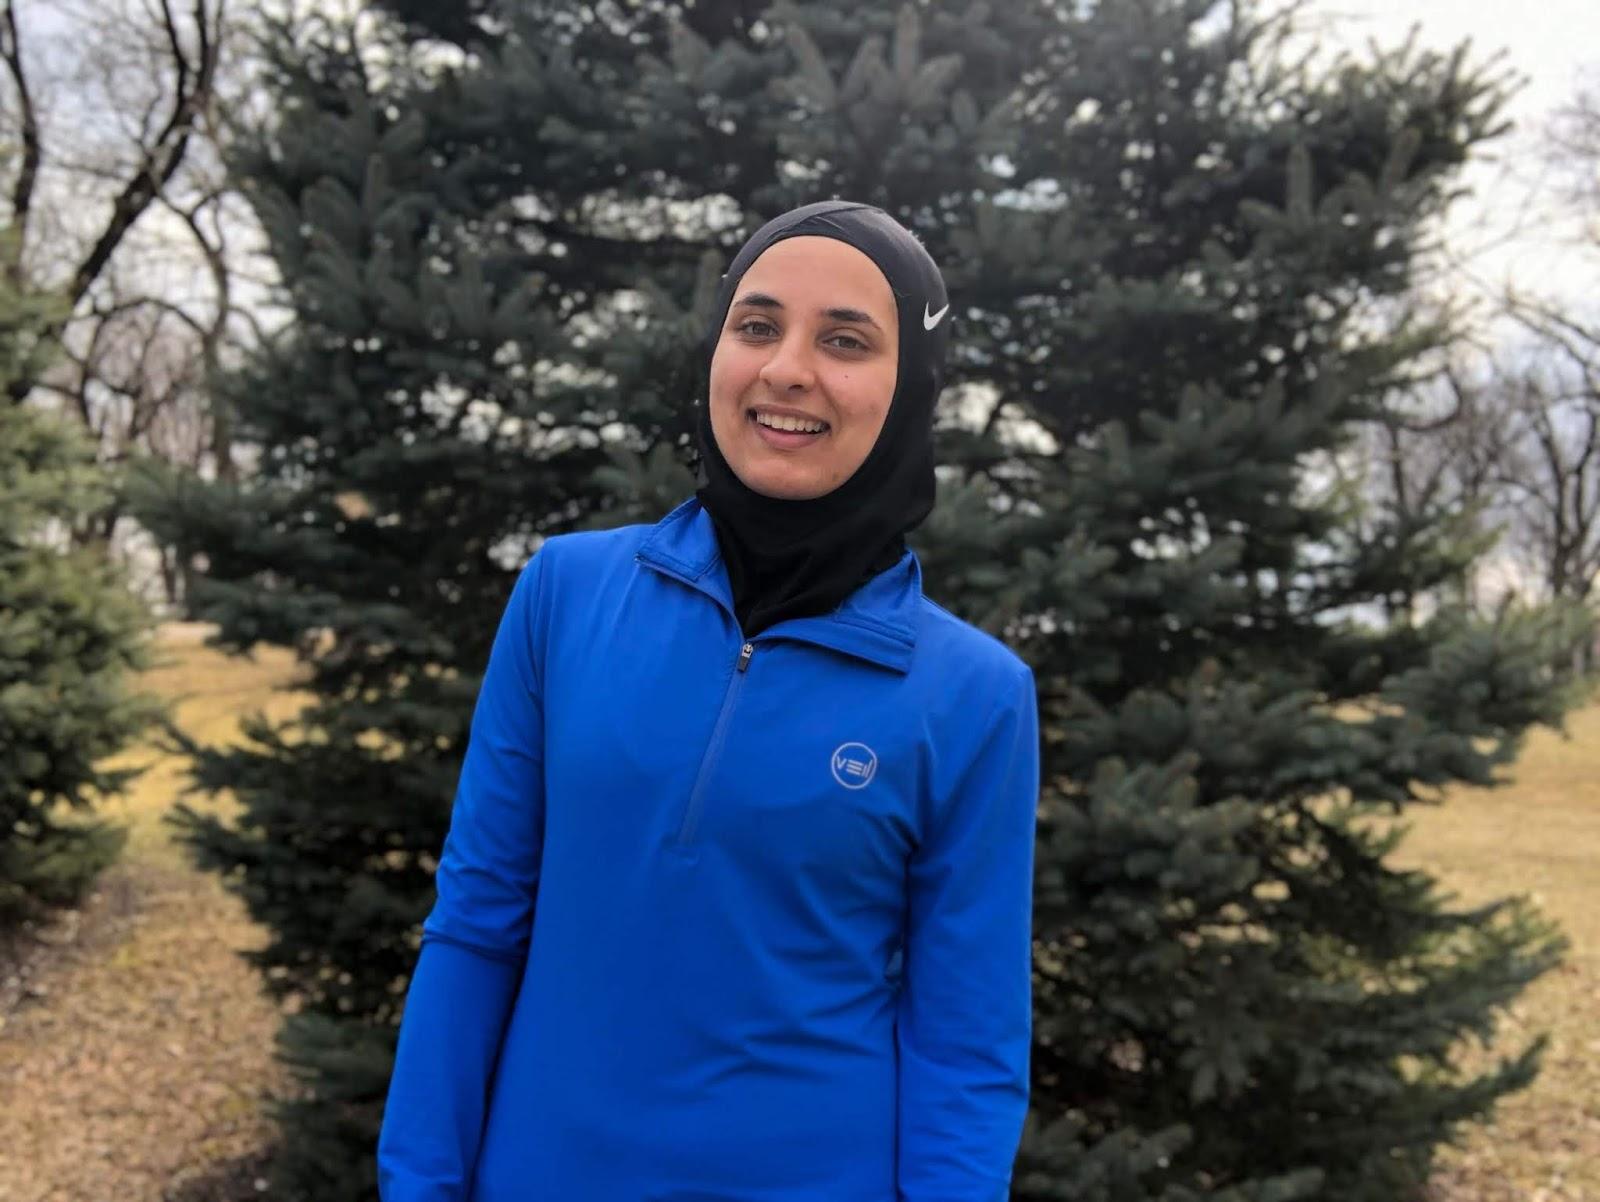 nike hijab runner